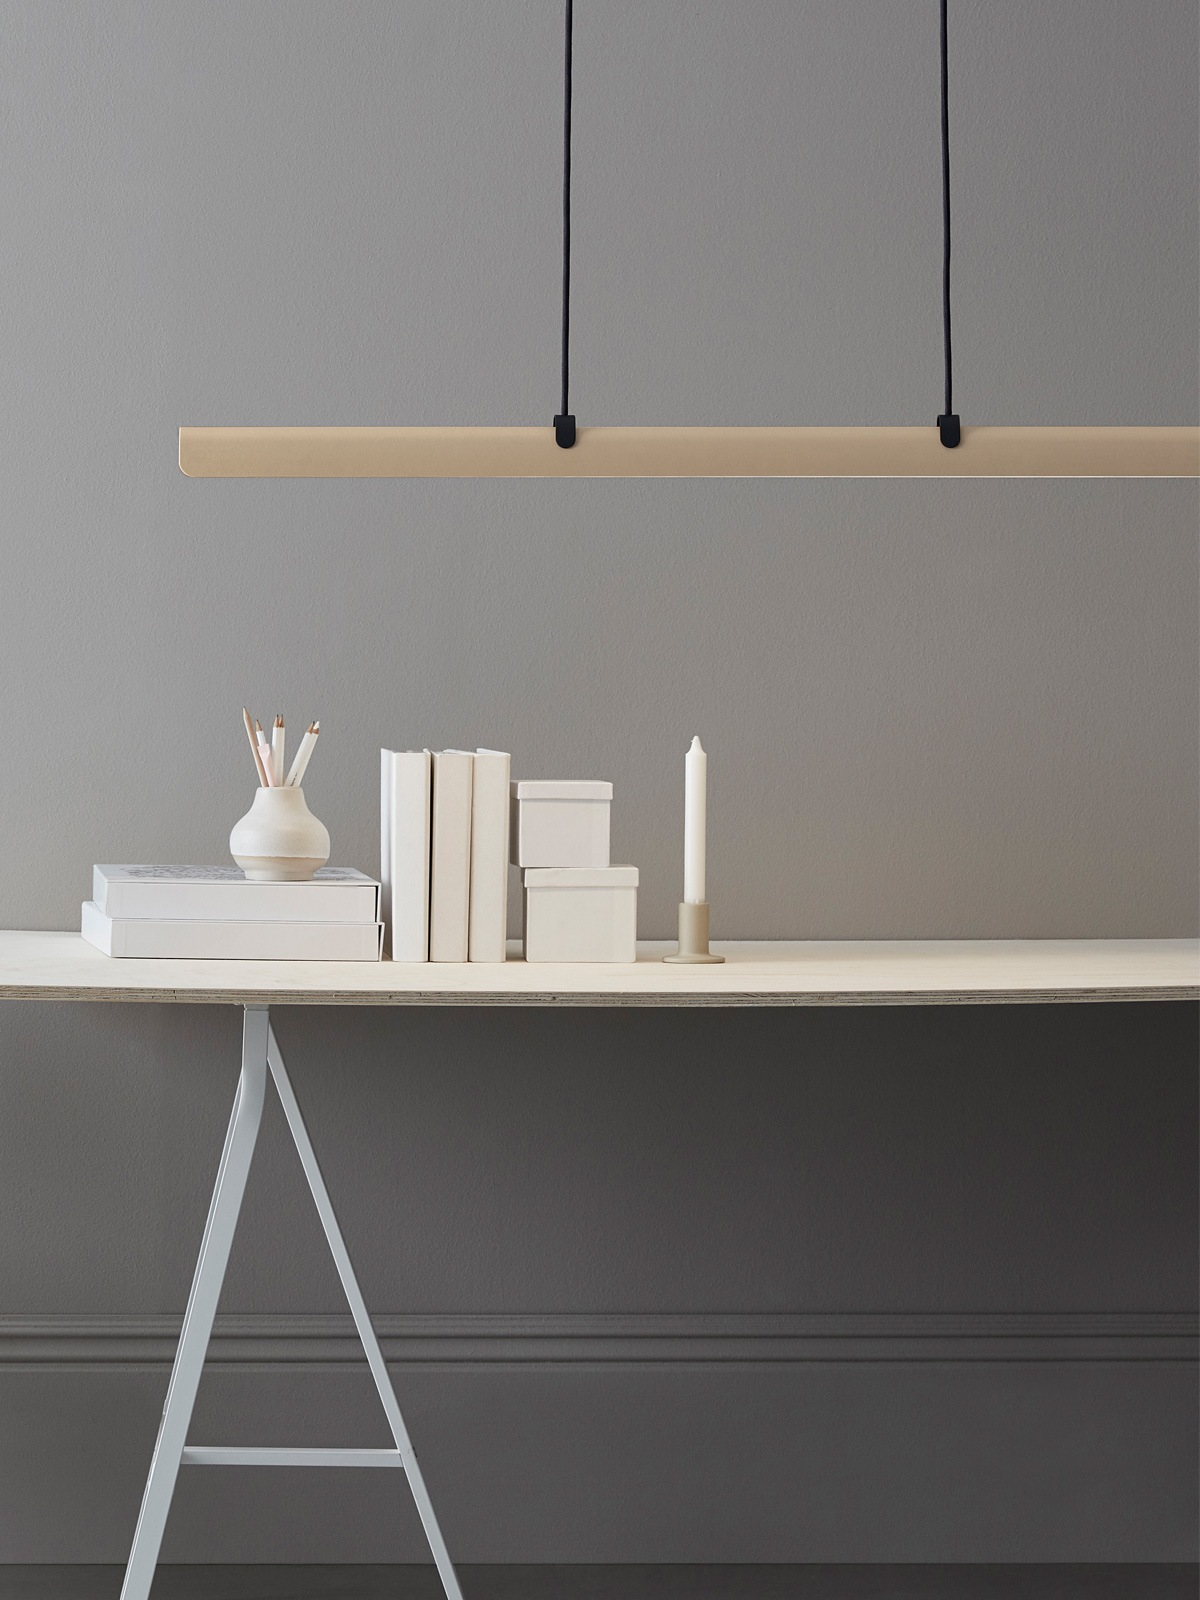 Belid Fold waagerechte lange Leuchte DesignOrt Designerlampen Berlin